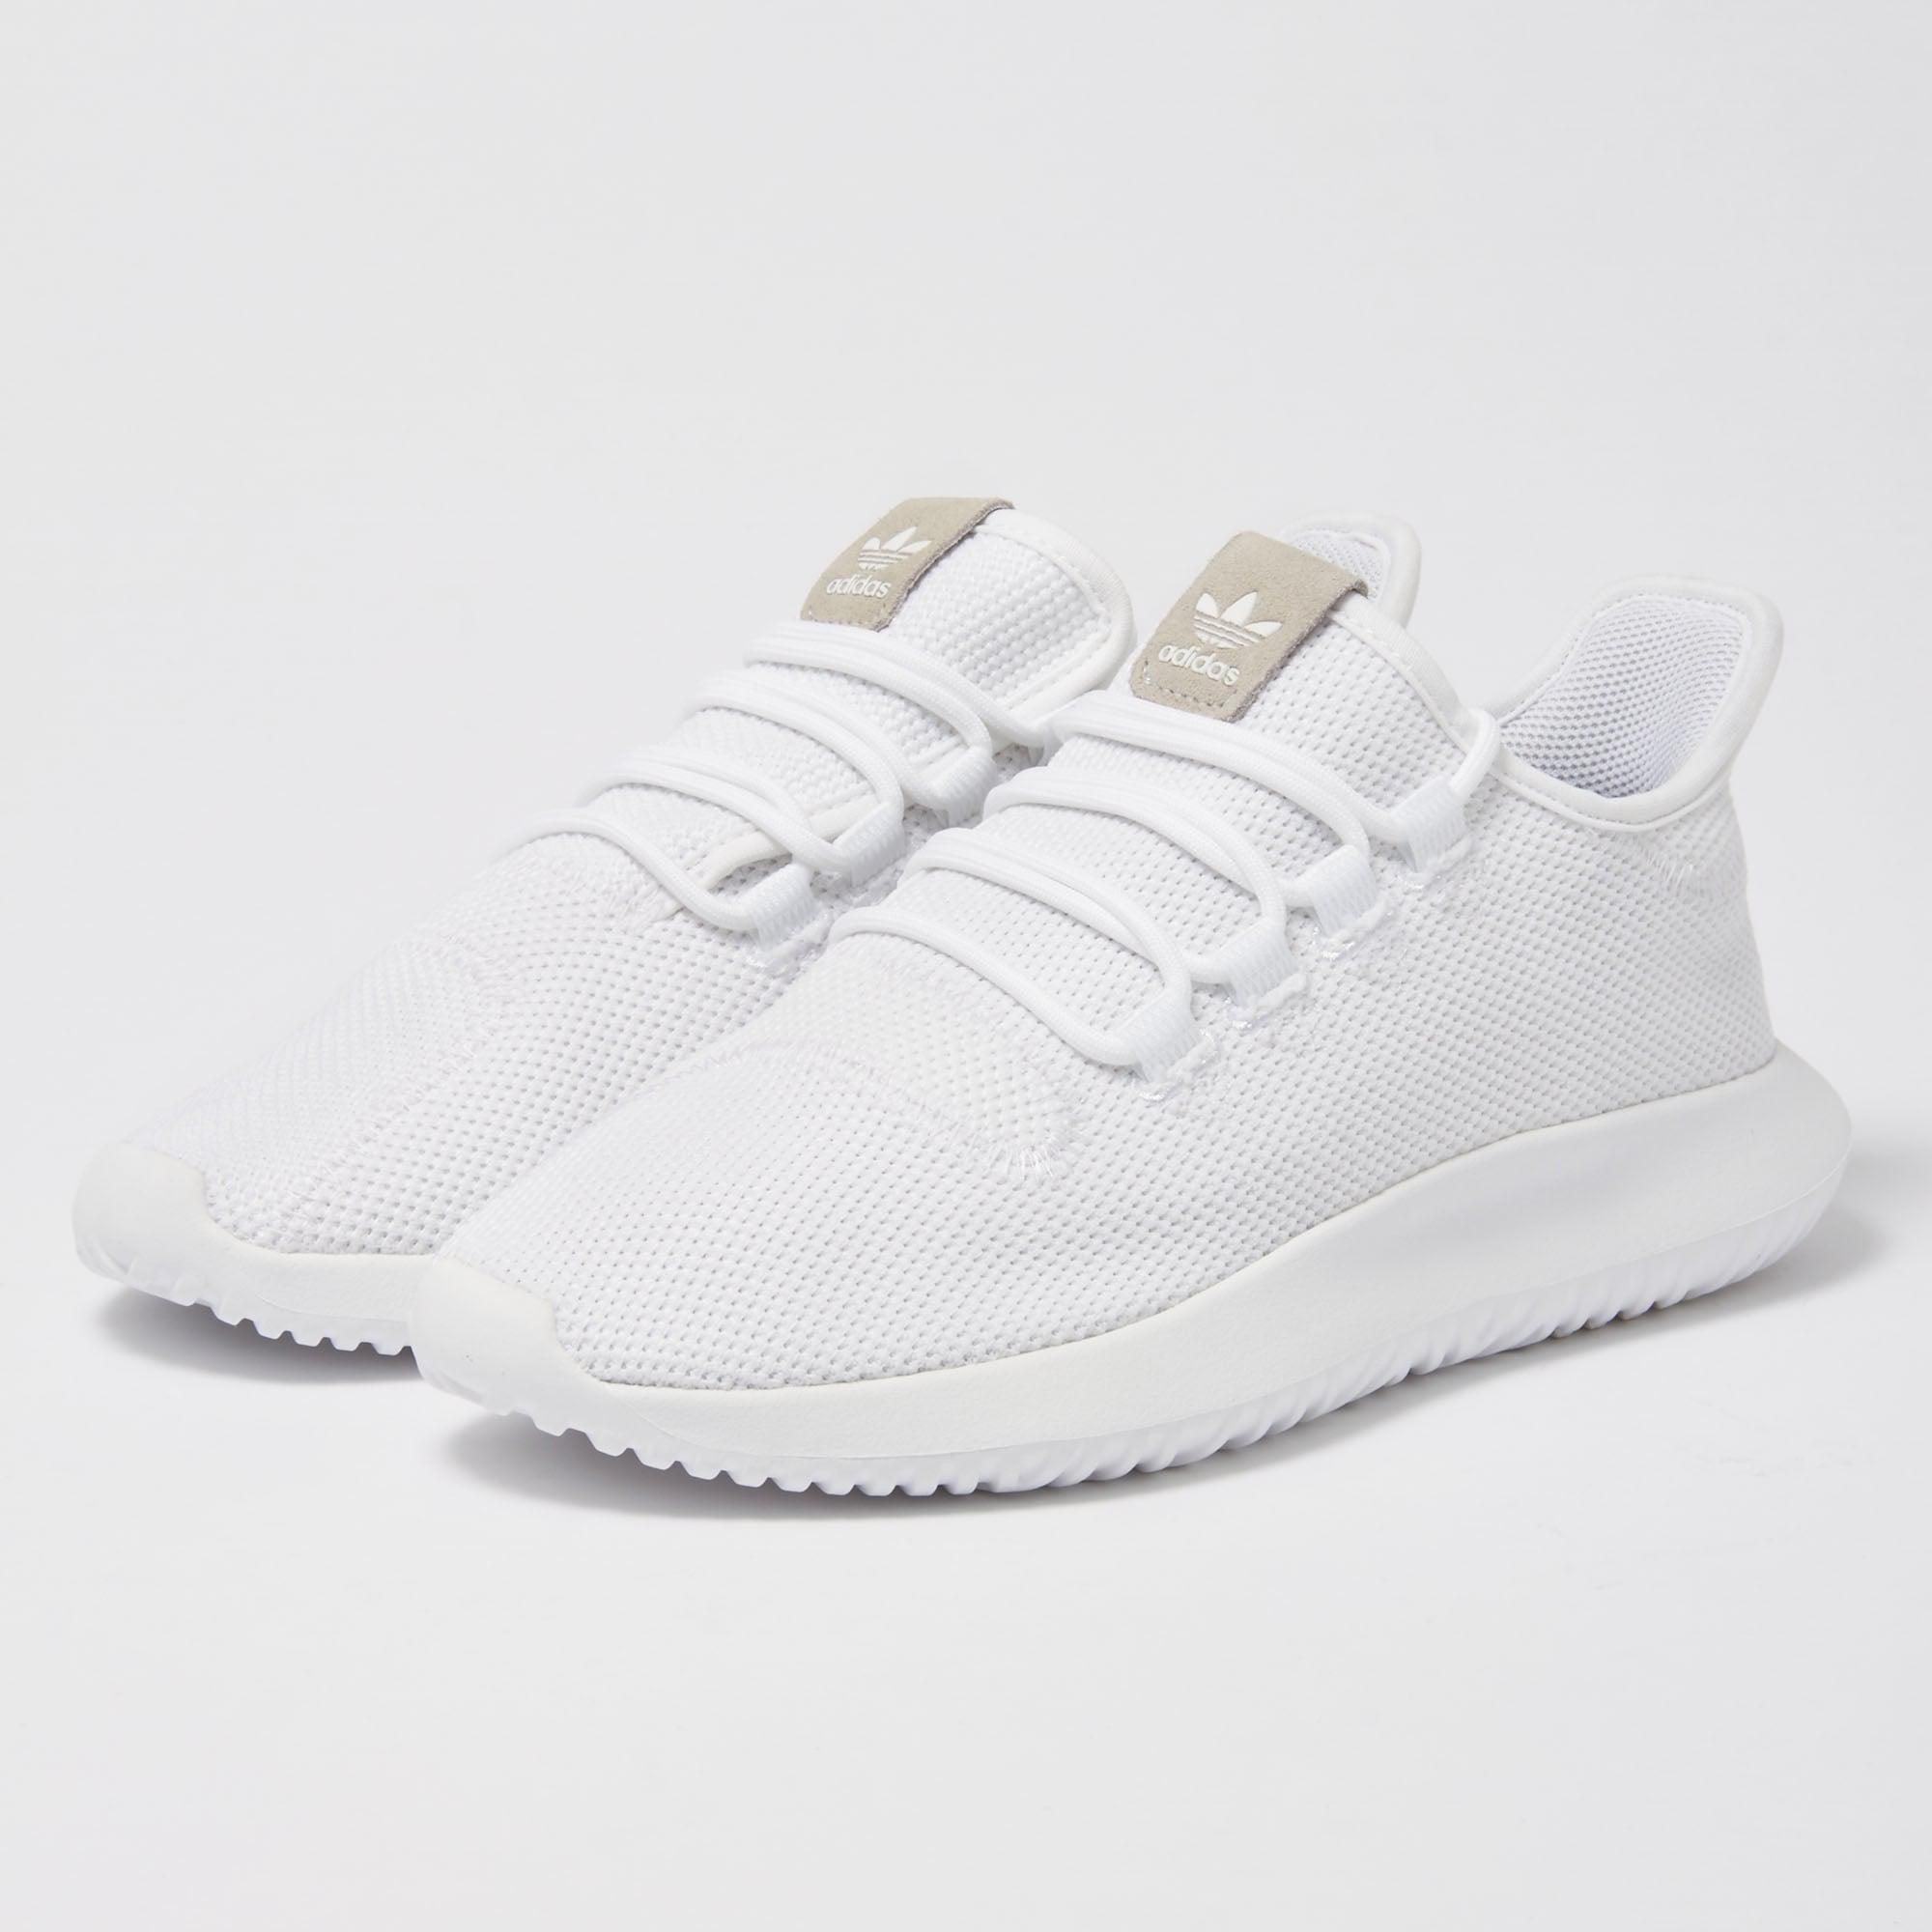 buy popular 6ba2d d3b37 Adidas Originals Tubular Shadow - Ftw White